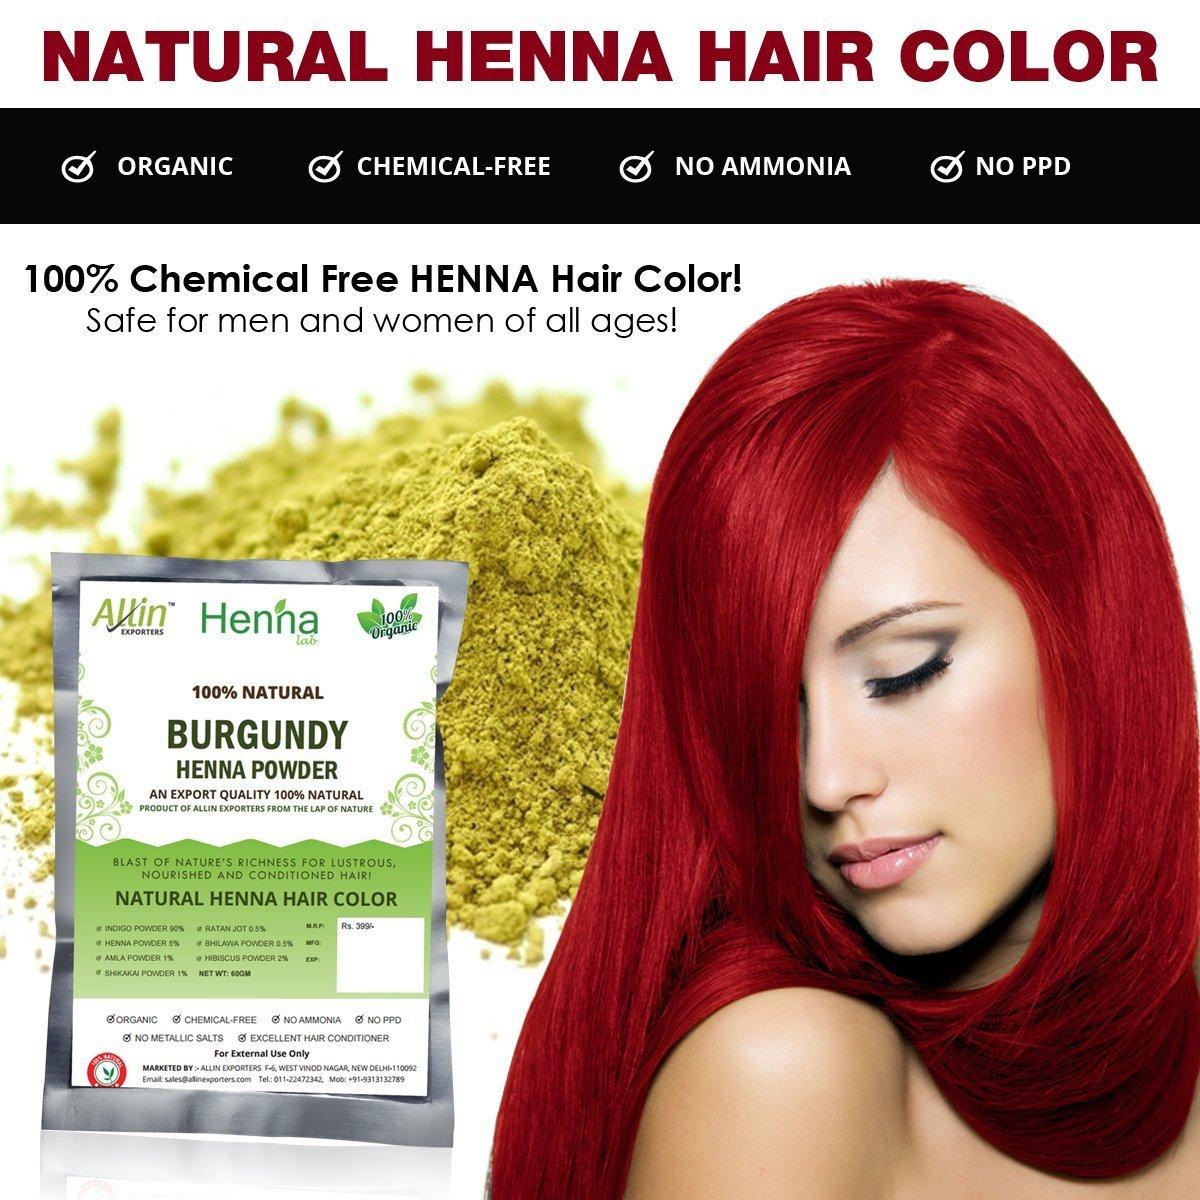 Cheap Henna Burgundy Hair Dye Find Henna Burgundy Hair Dye Deals On